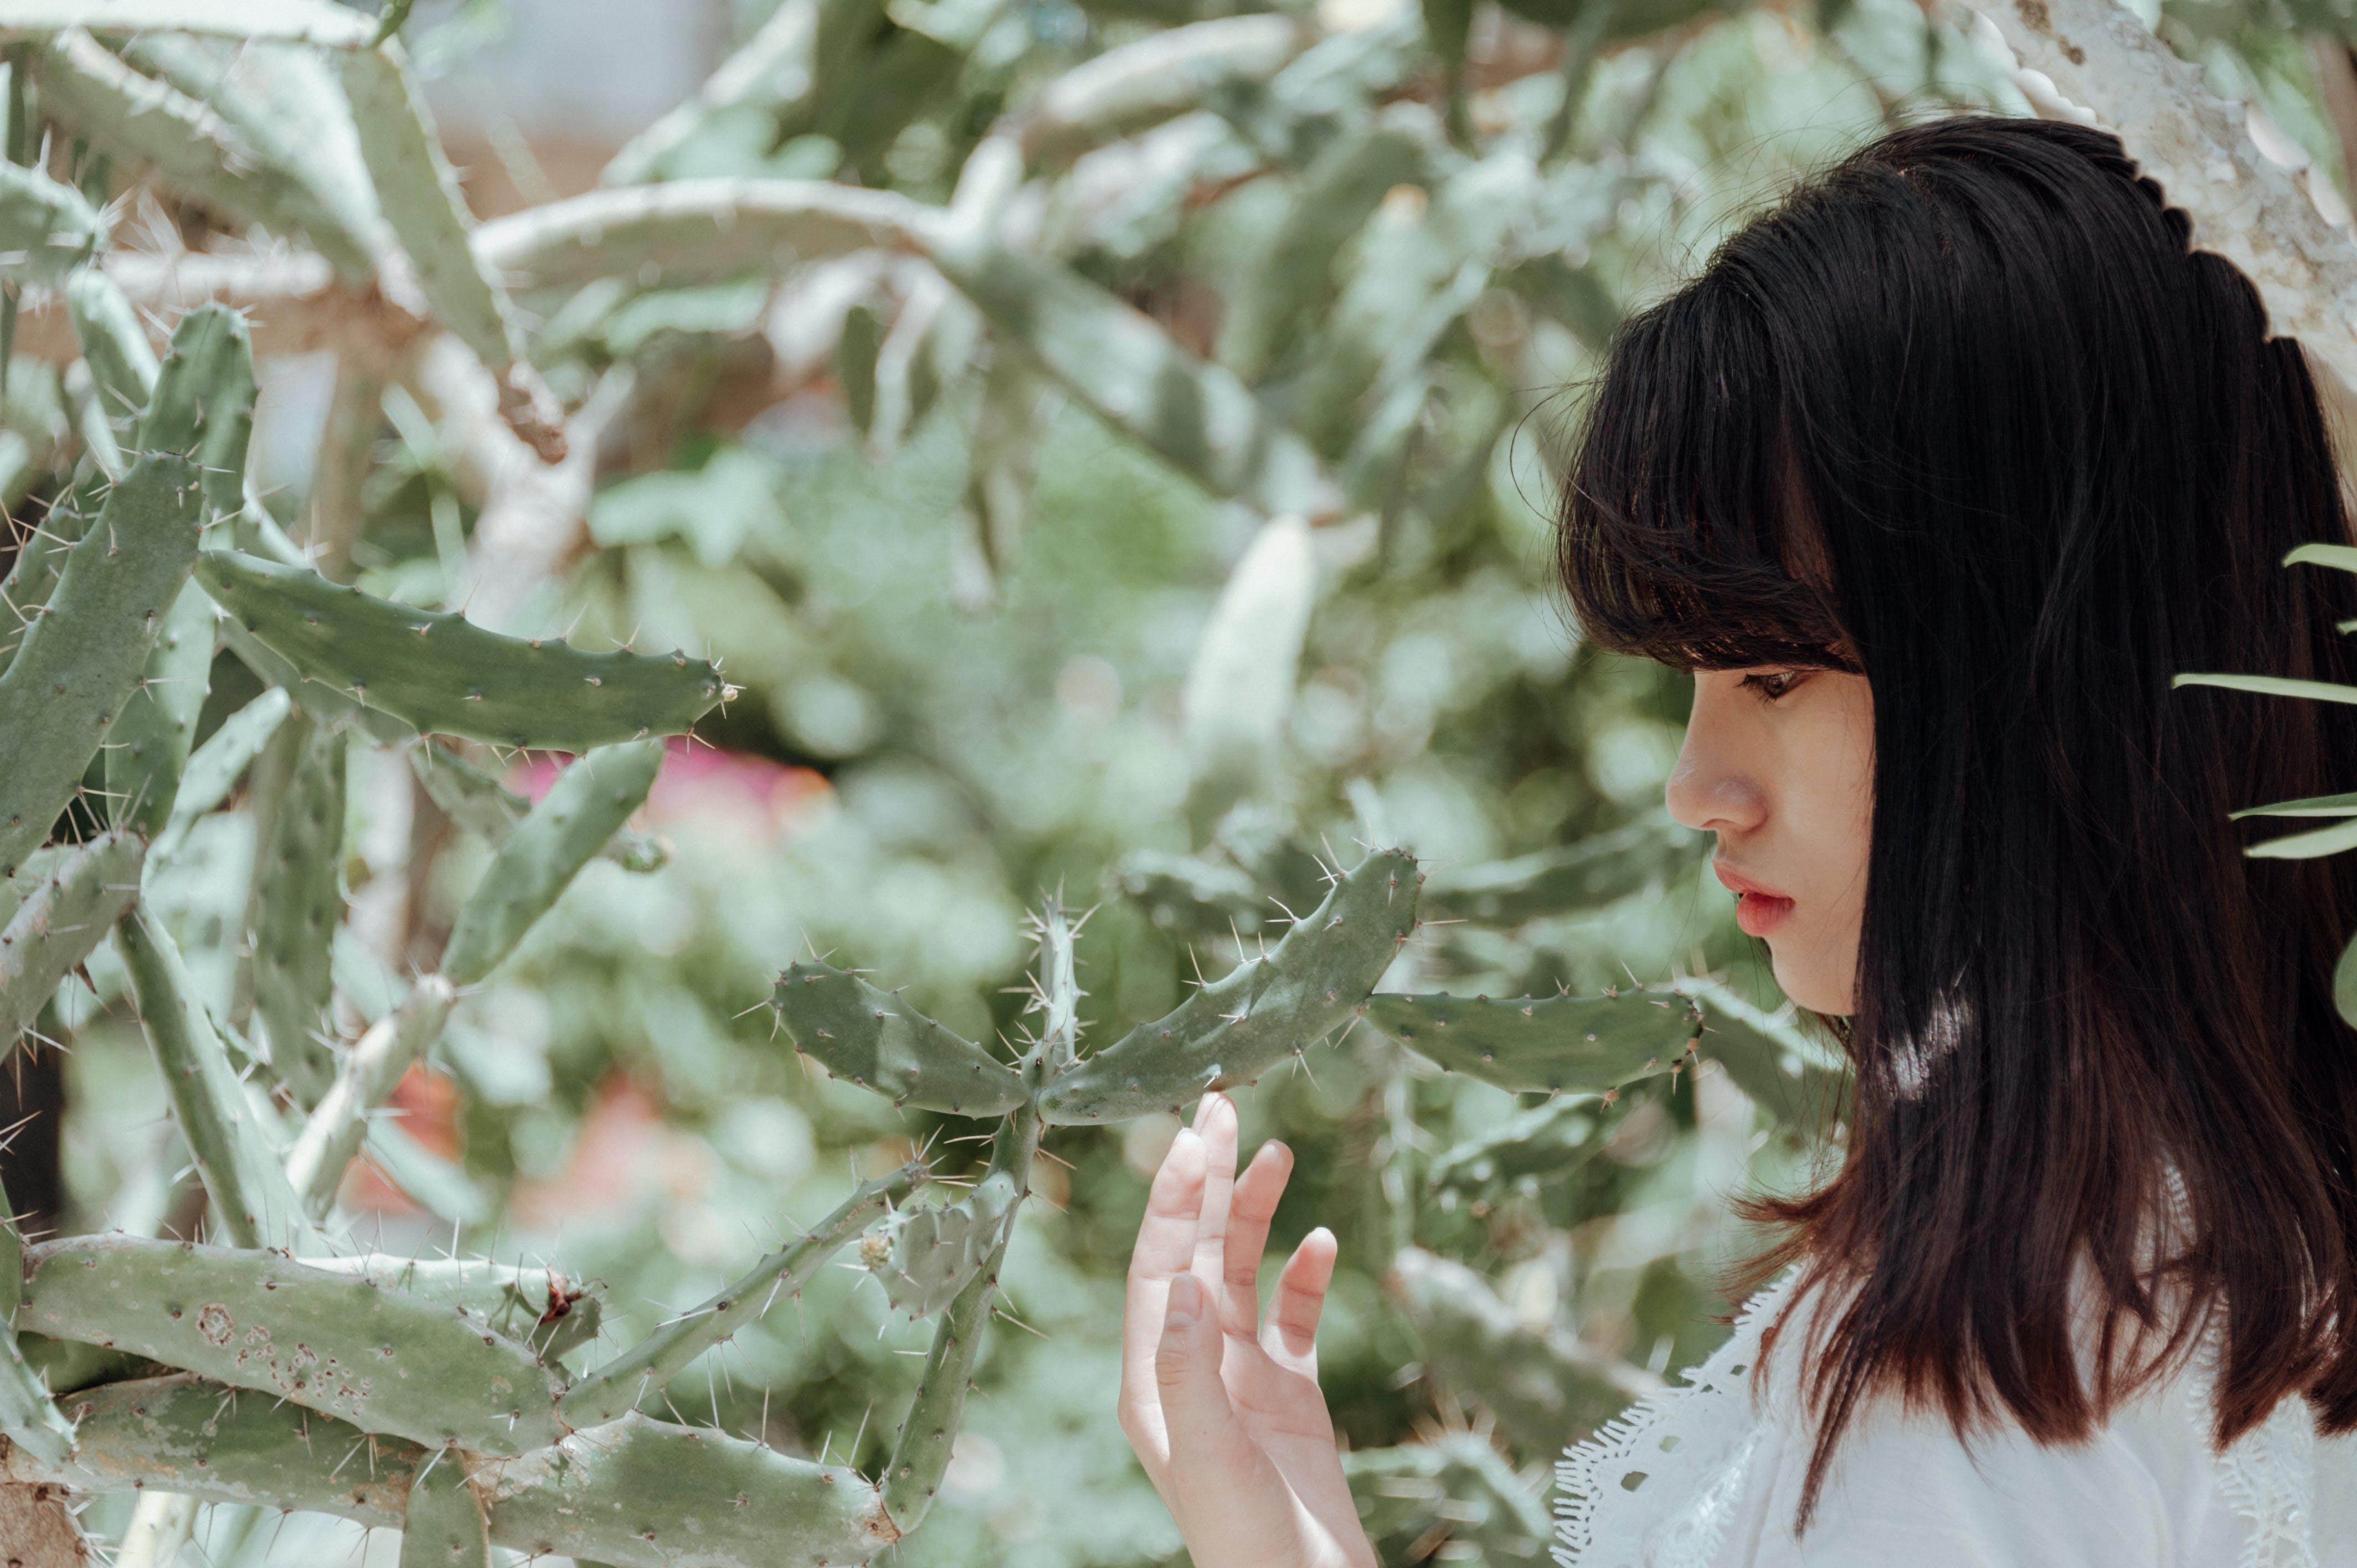 Woman Taking Photo Beside Cactus Plant